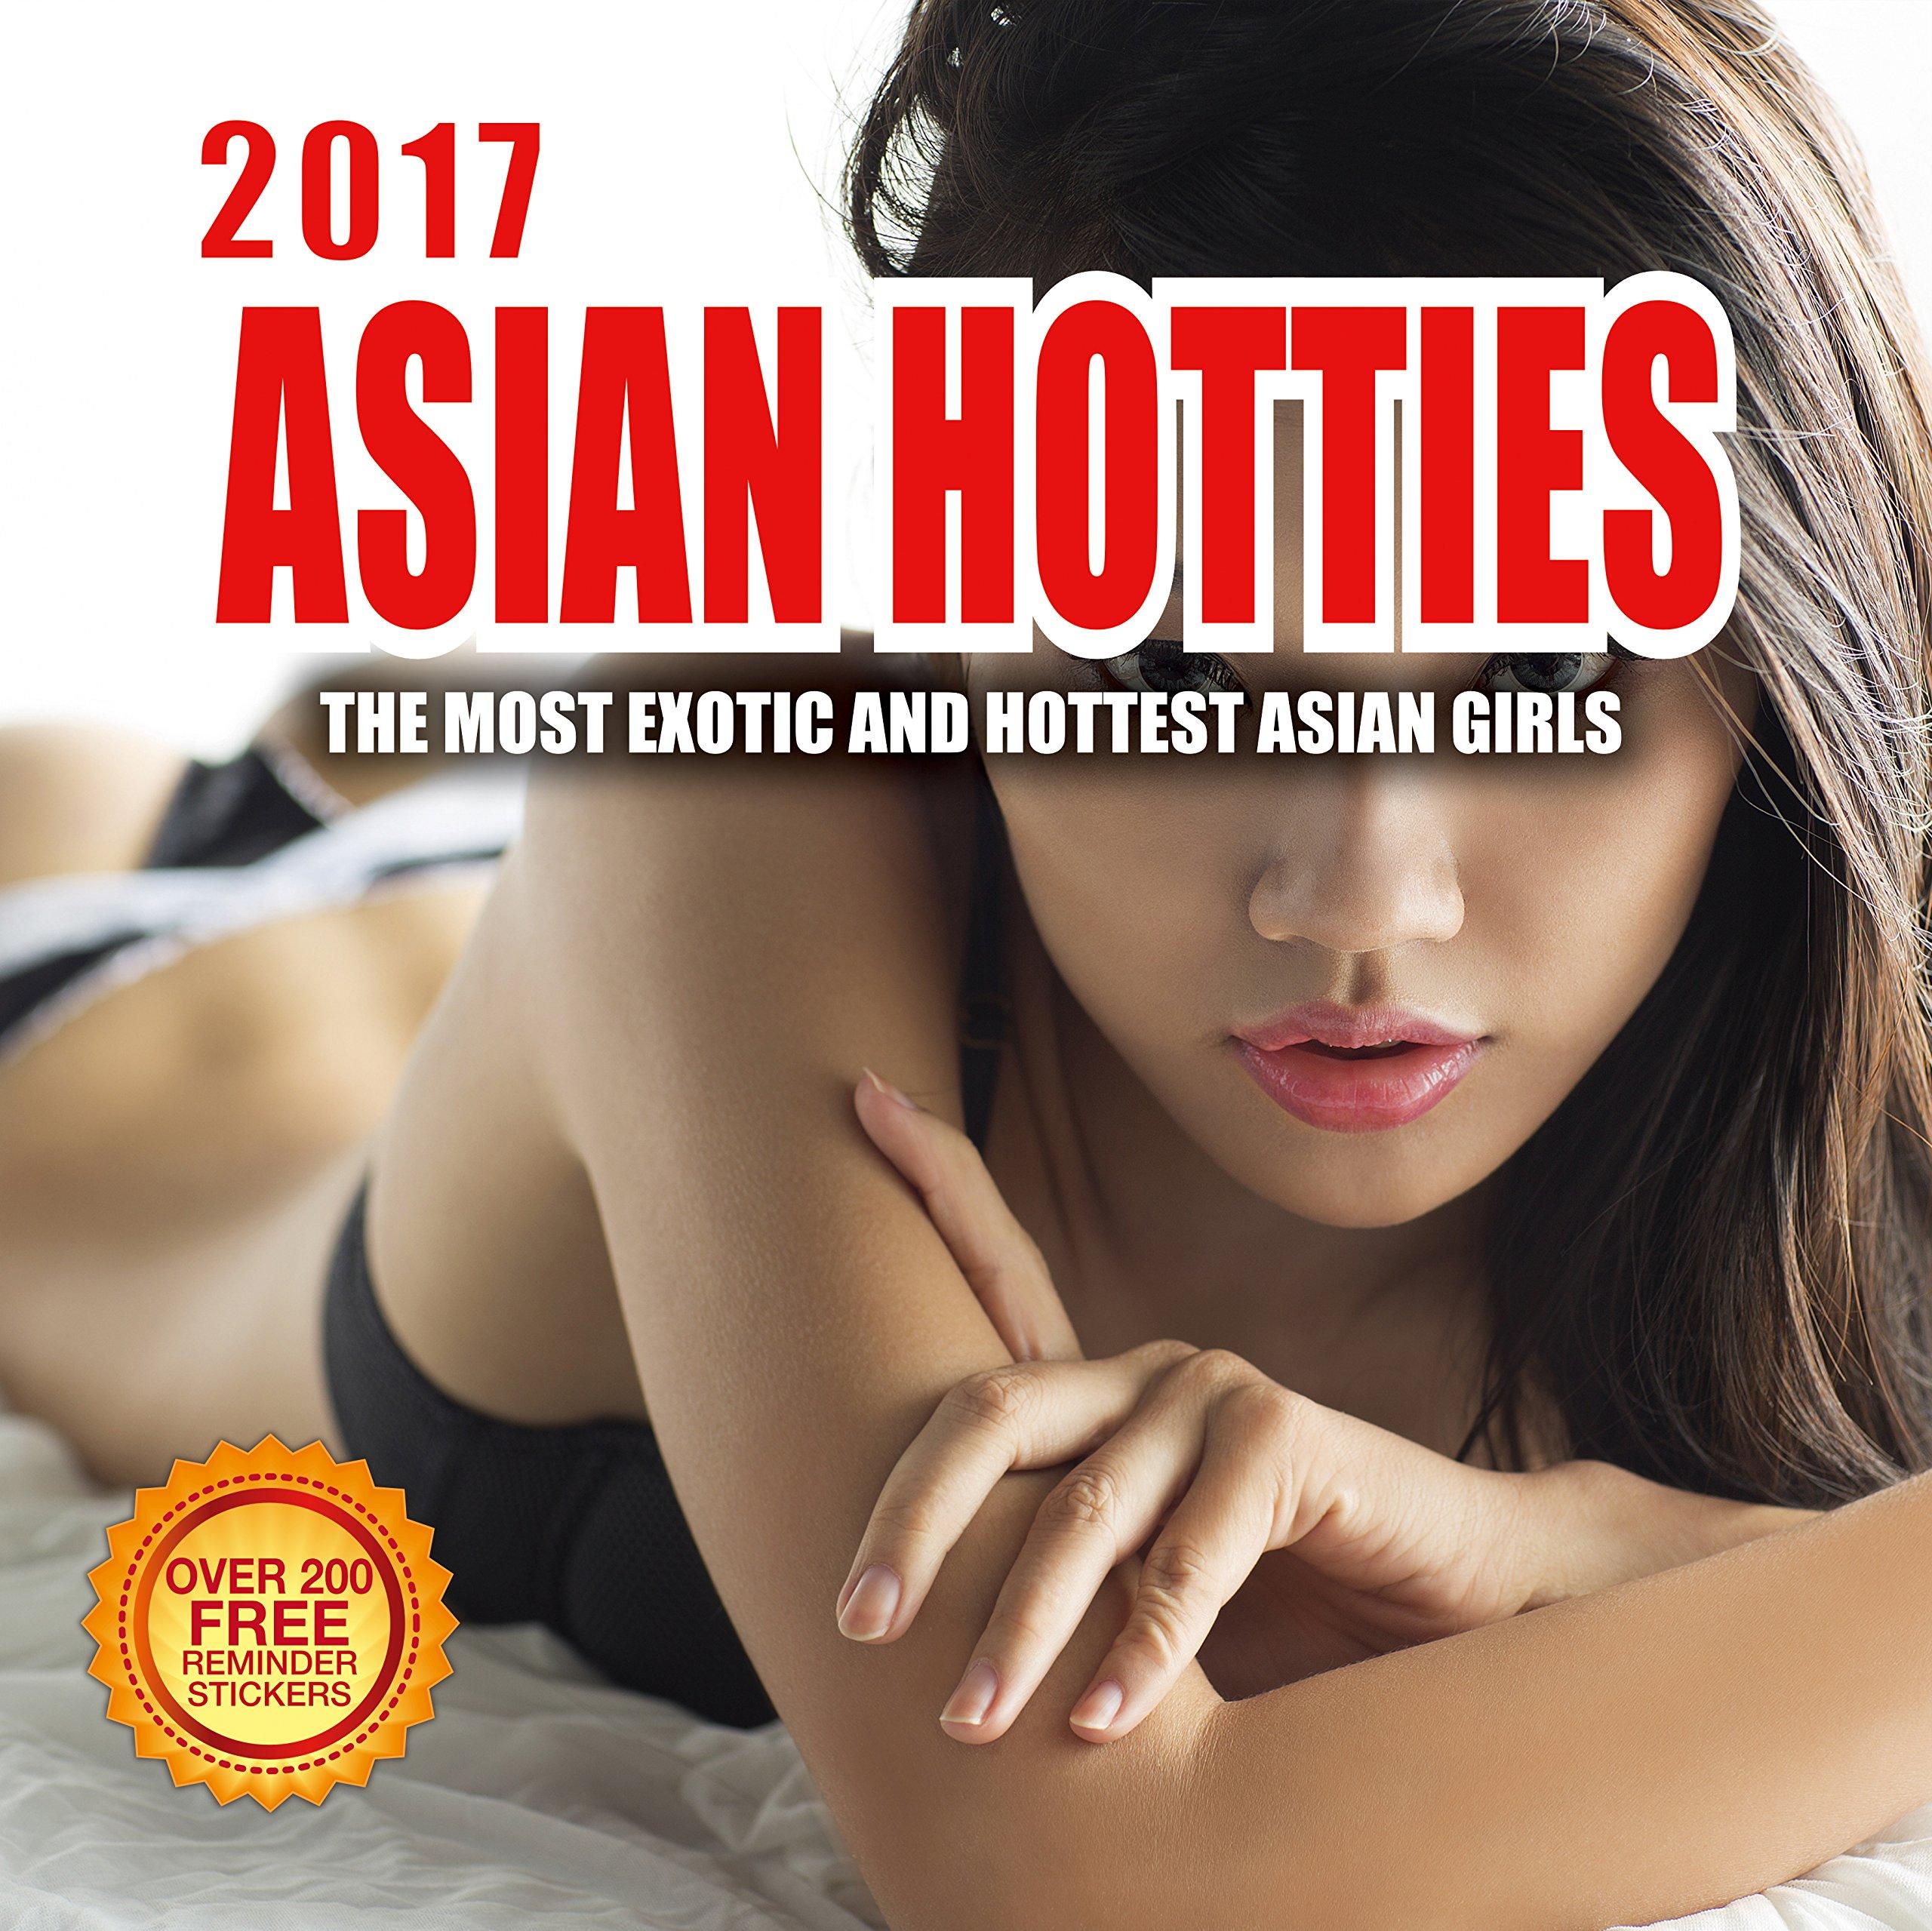 Asian girl calendars all became